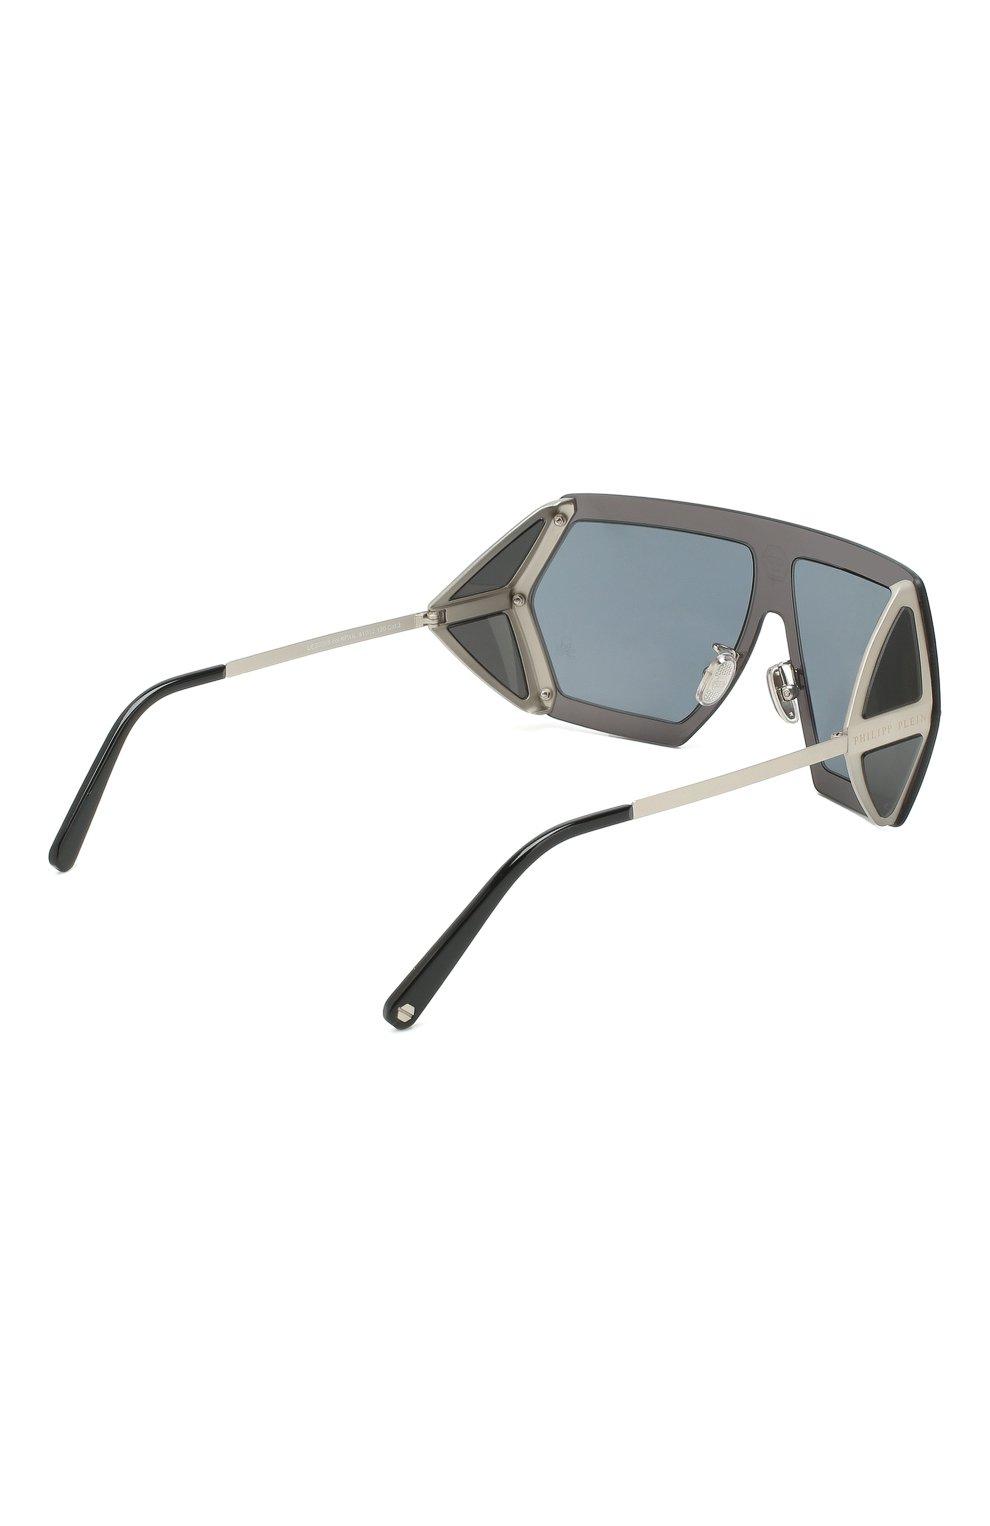 Мужские солнцезащитные очки PHILIPP PLEIN синего цвета, арт. UES0068 | Фото 3